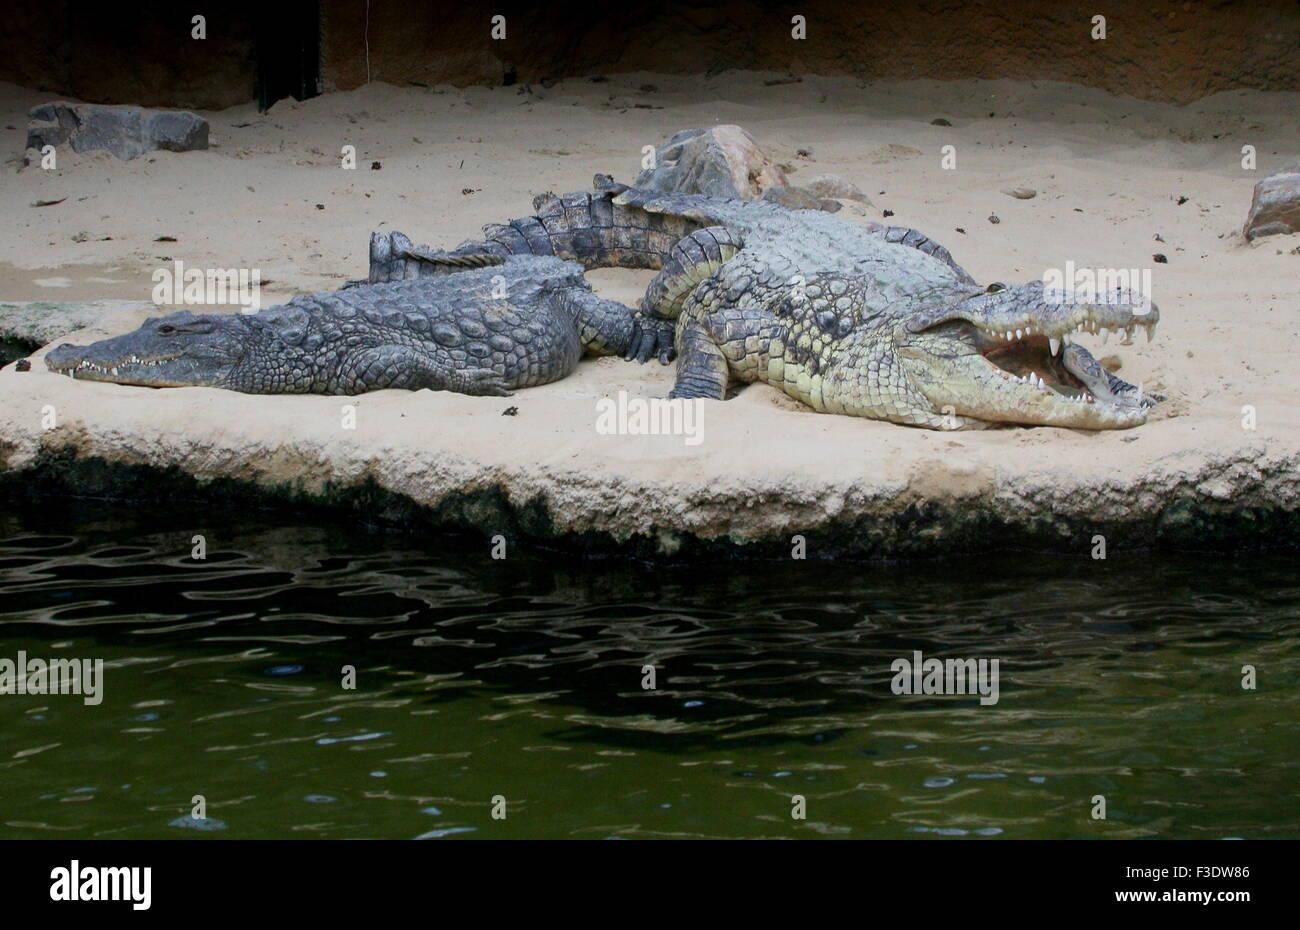 Mature African Nile crocodile (Crocodylus niloticus) basking in the sun - Stock Image